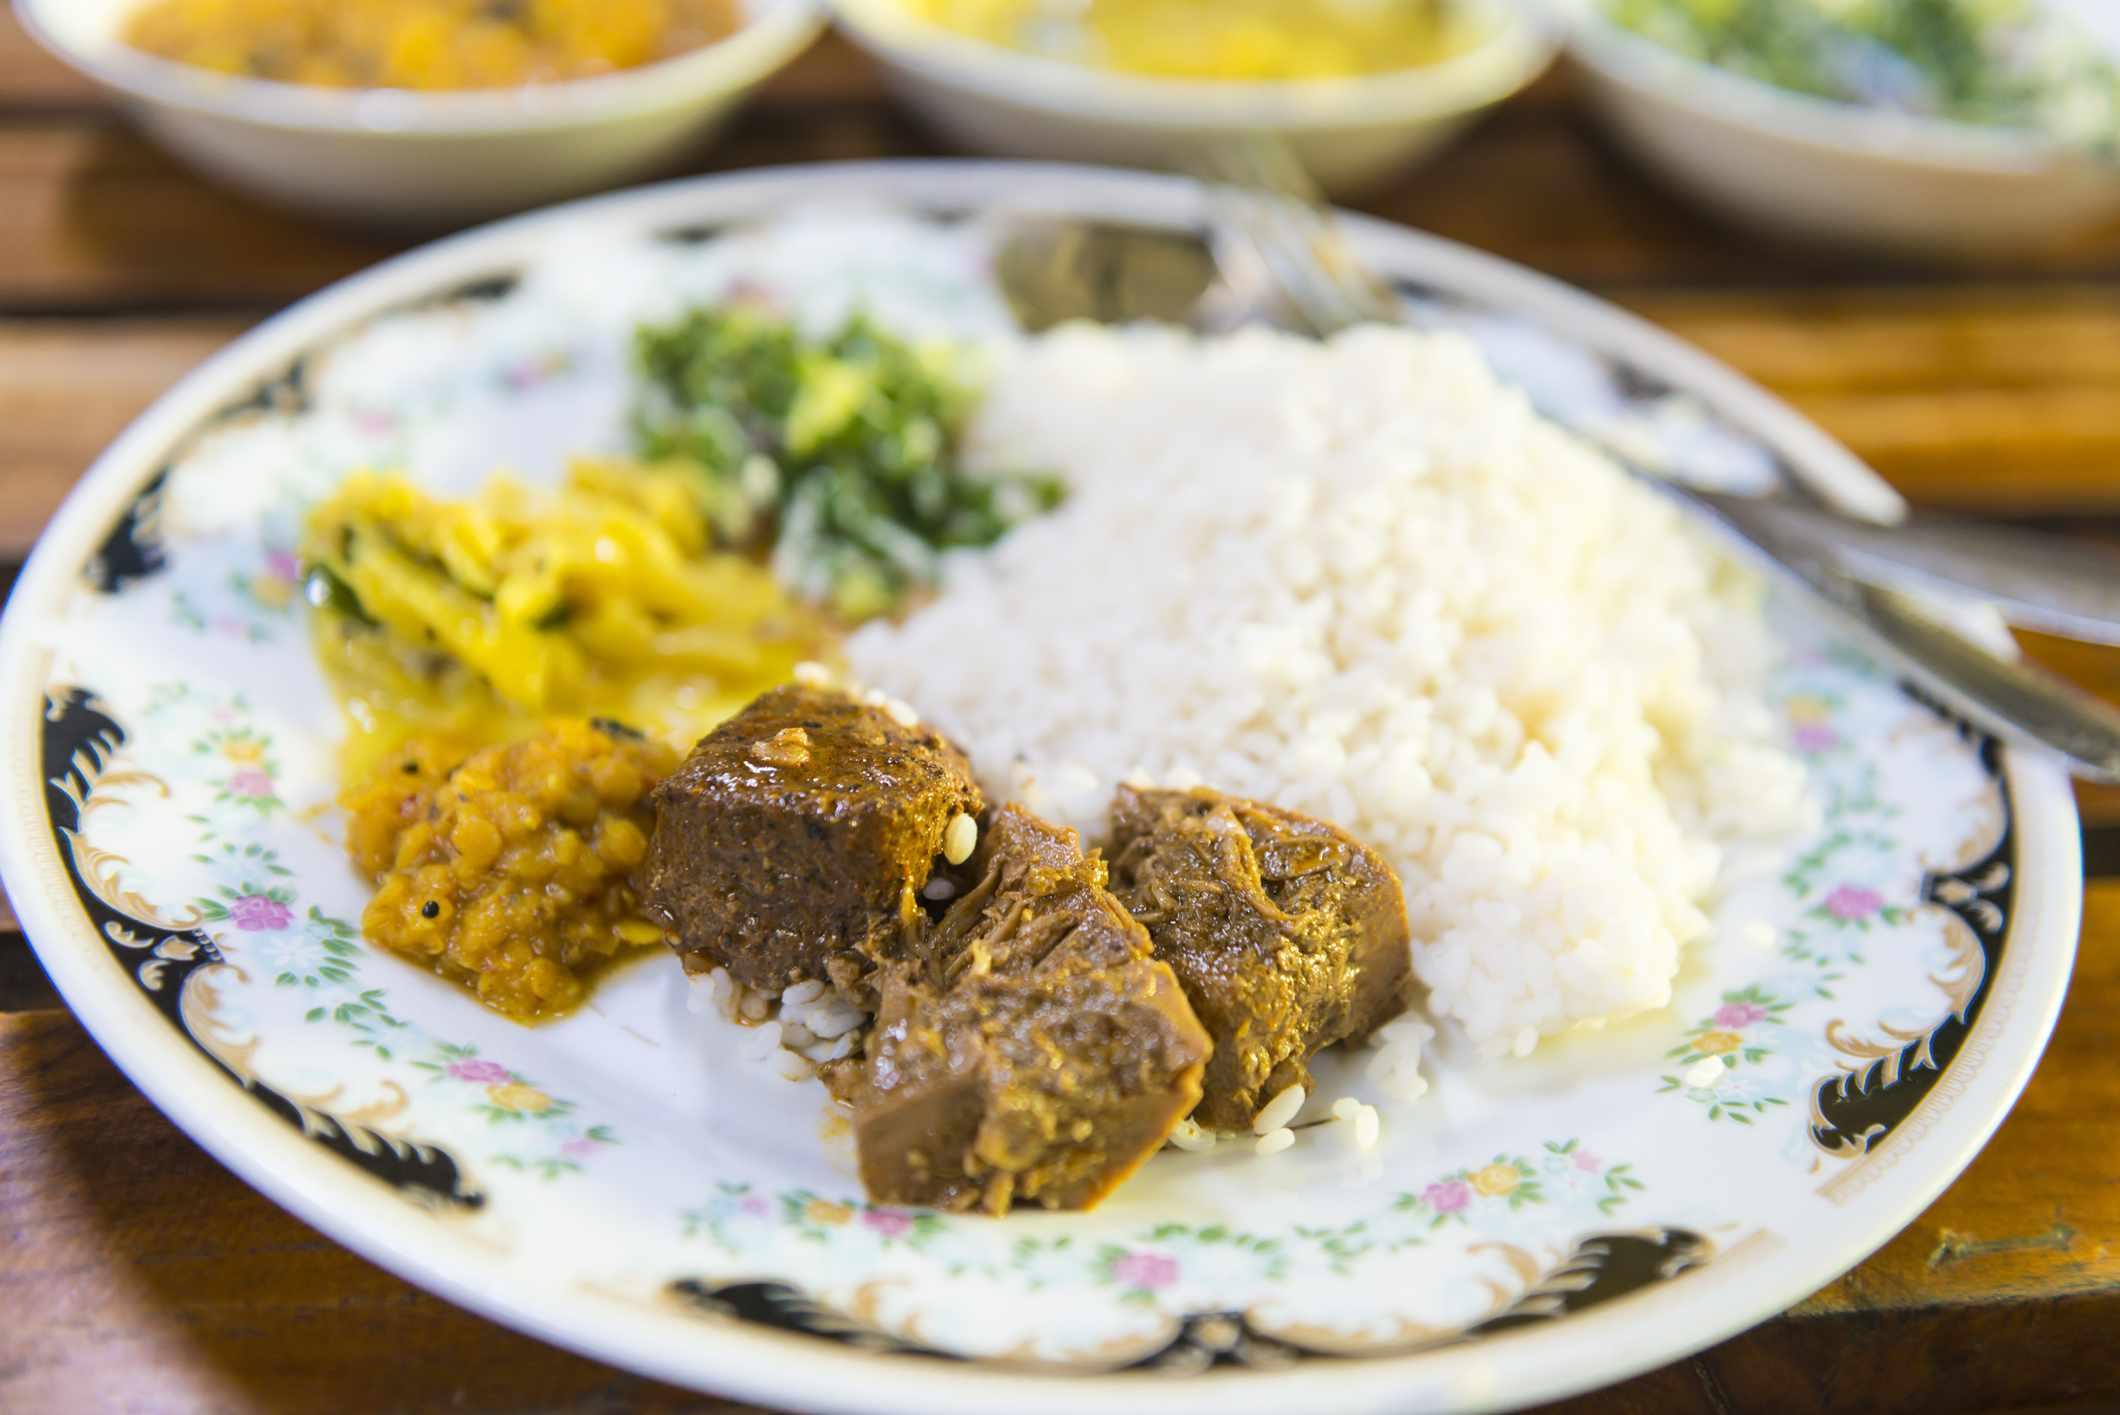 Jackfruit curry in Sri Lanka with rice and chutneys